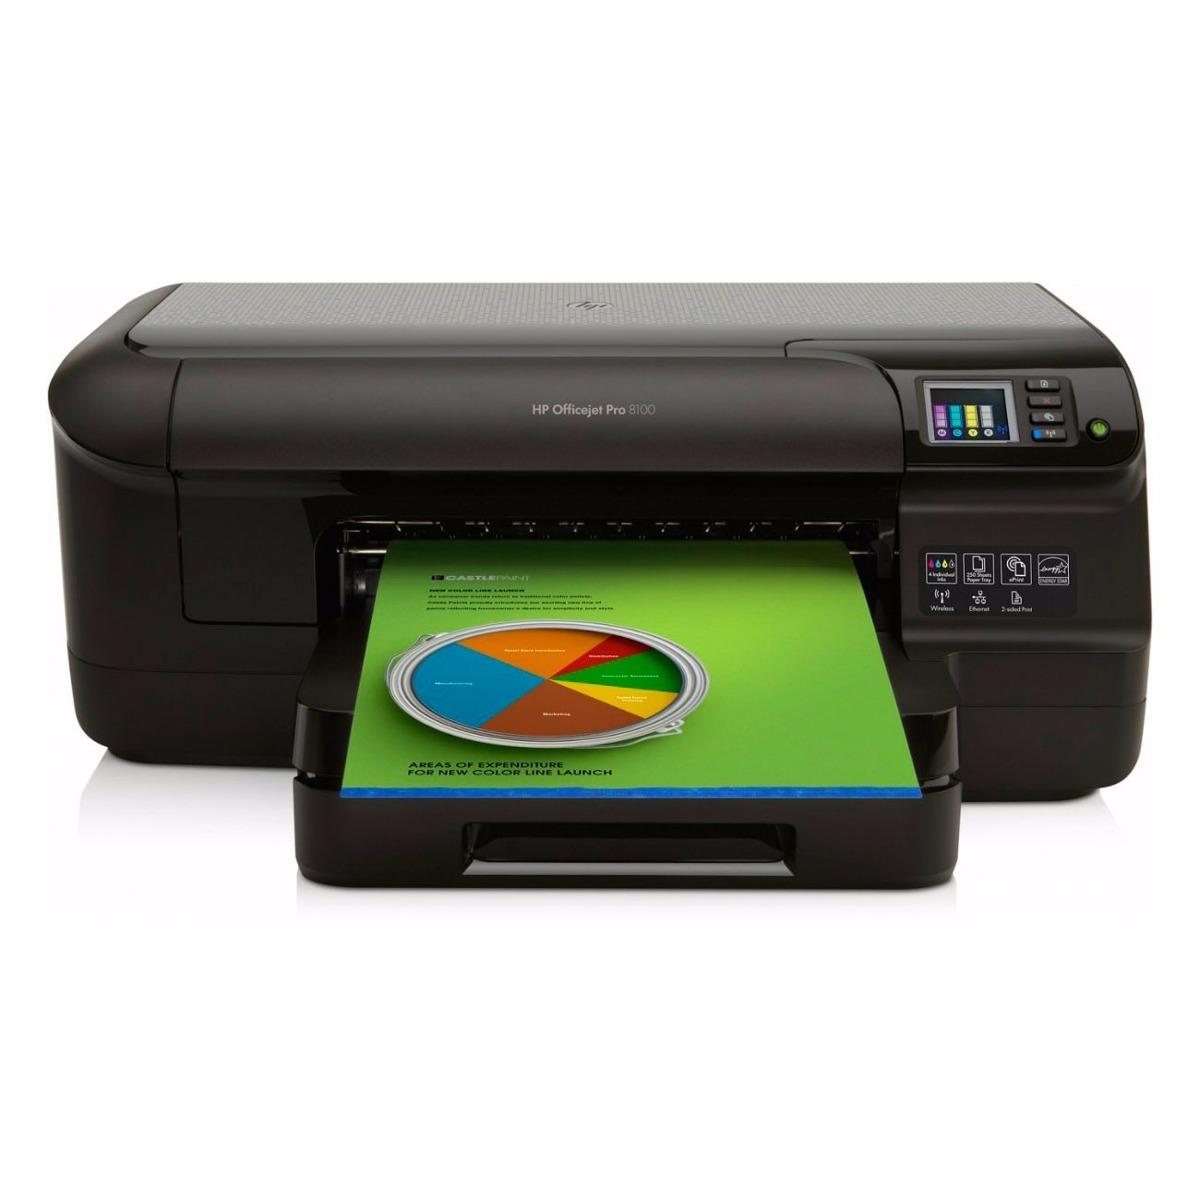 Descargar Hp Officejet Pro 8100 Driver Impresora Gratis